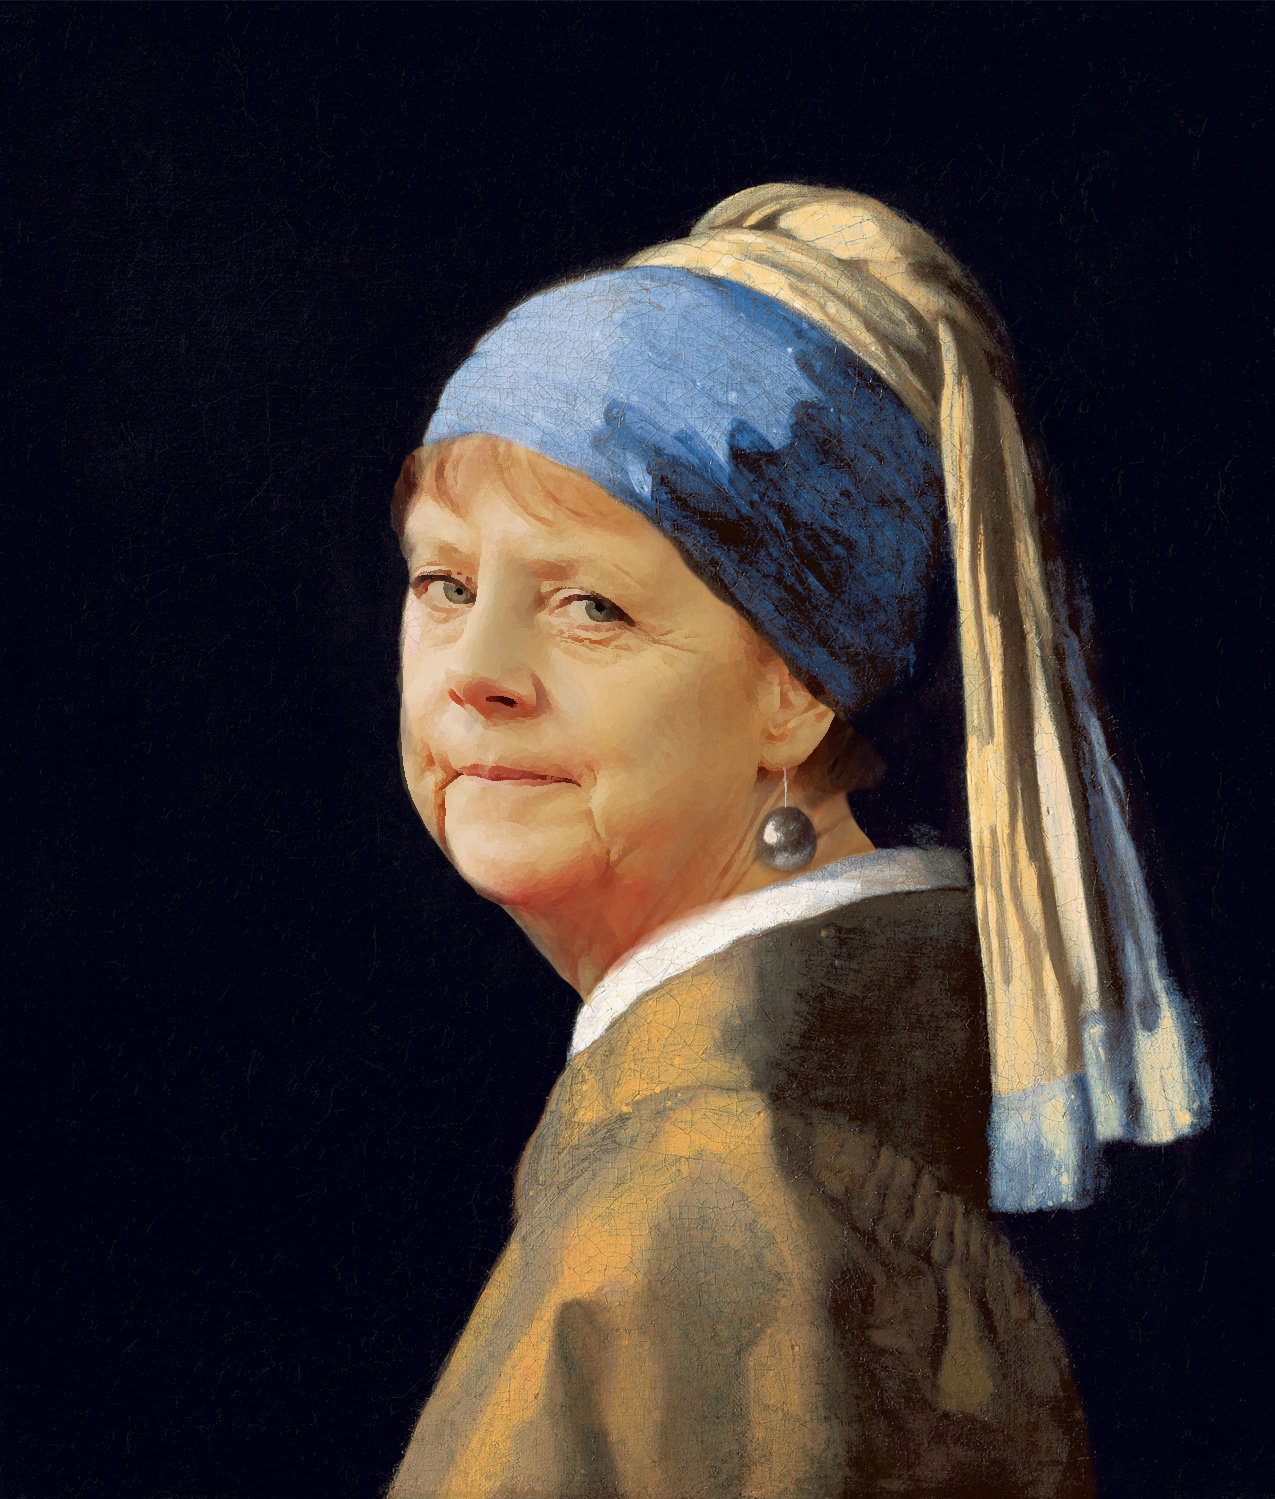 Merkel à la perle